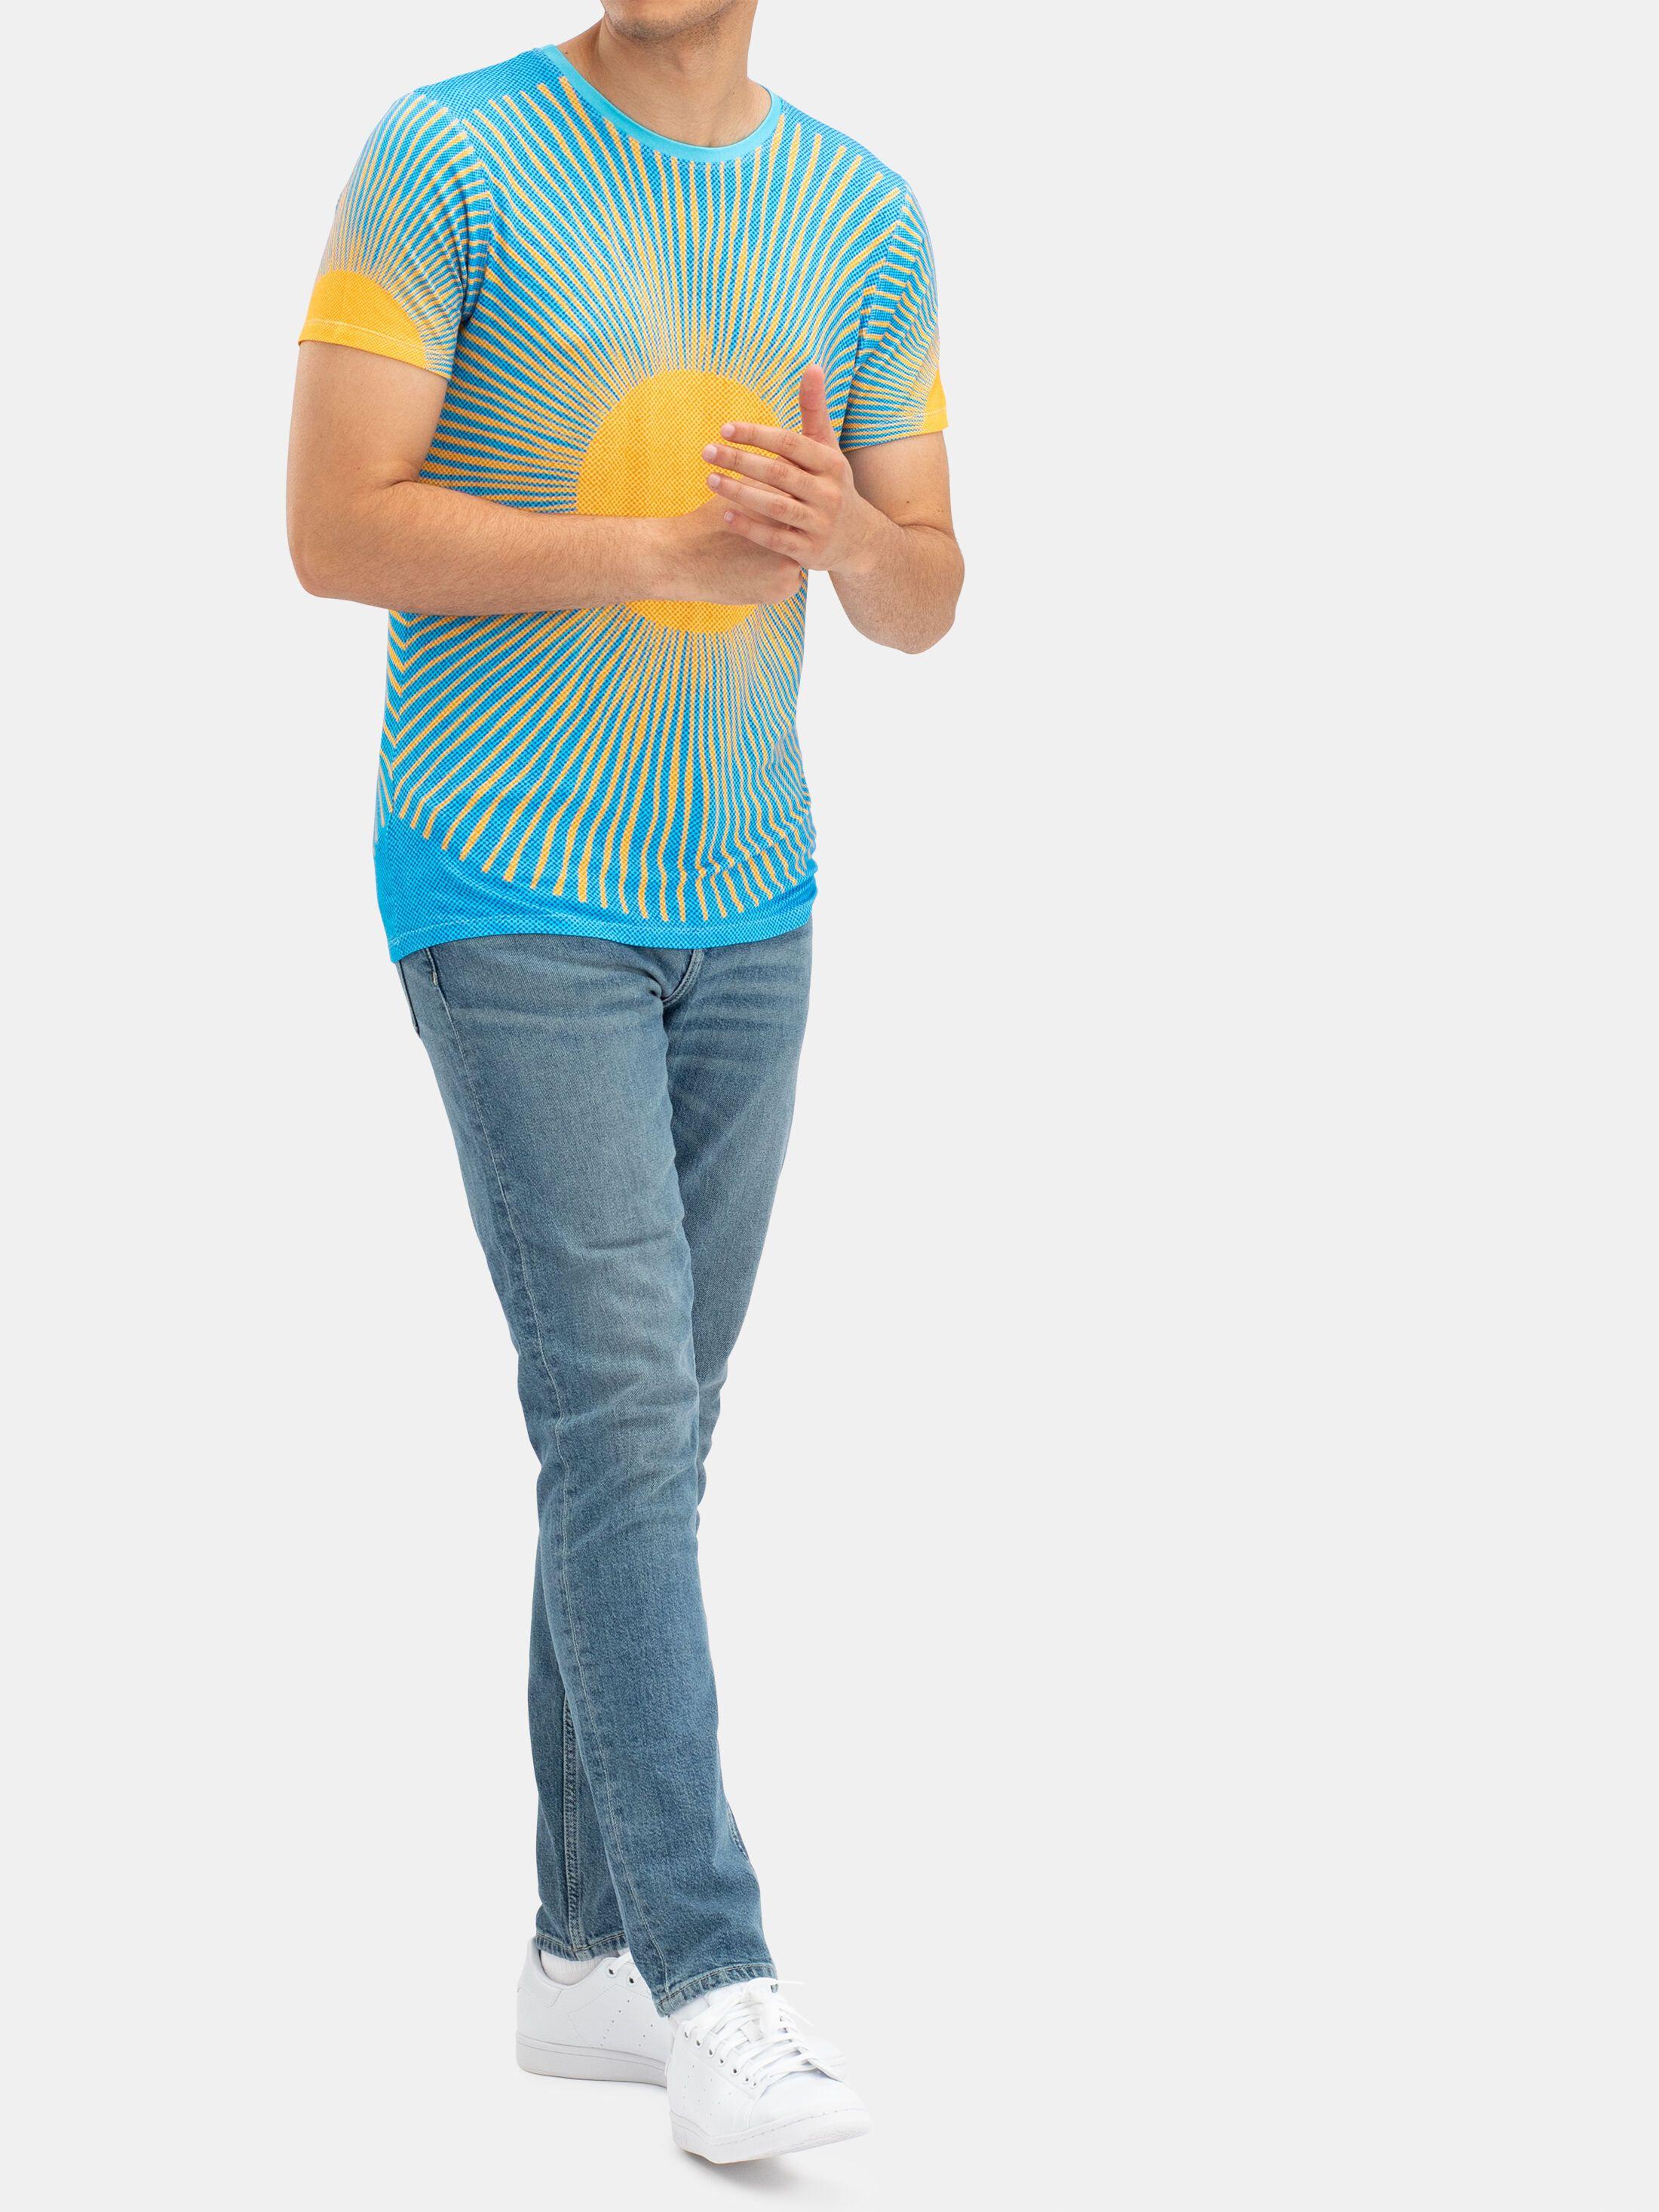 custom mens long sleeve tight fit tshirts